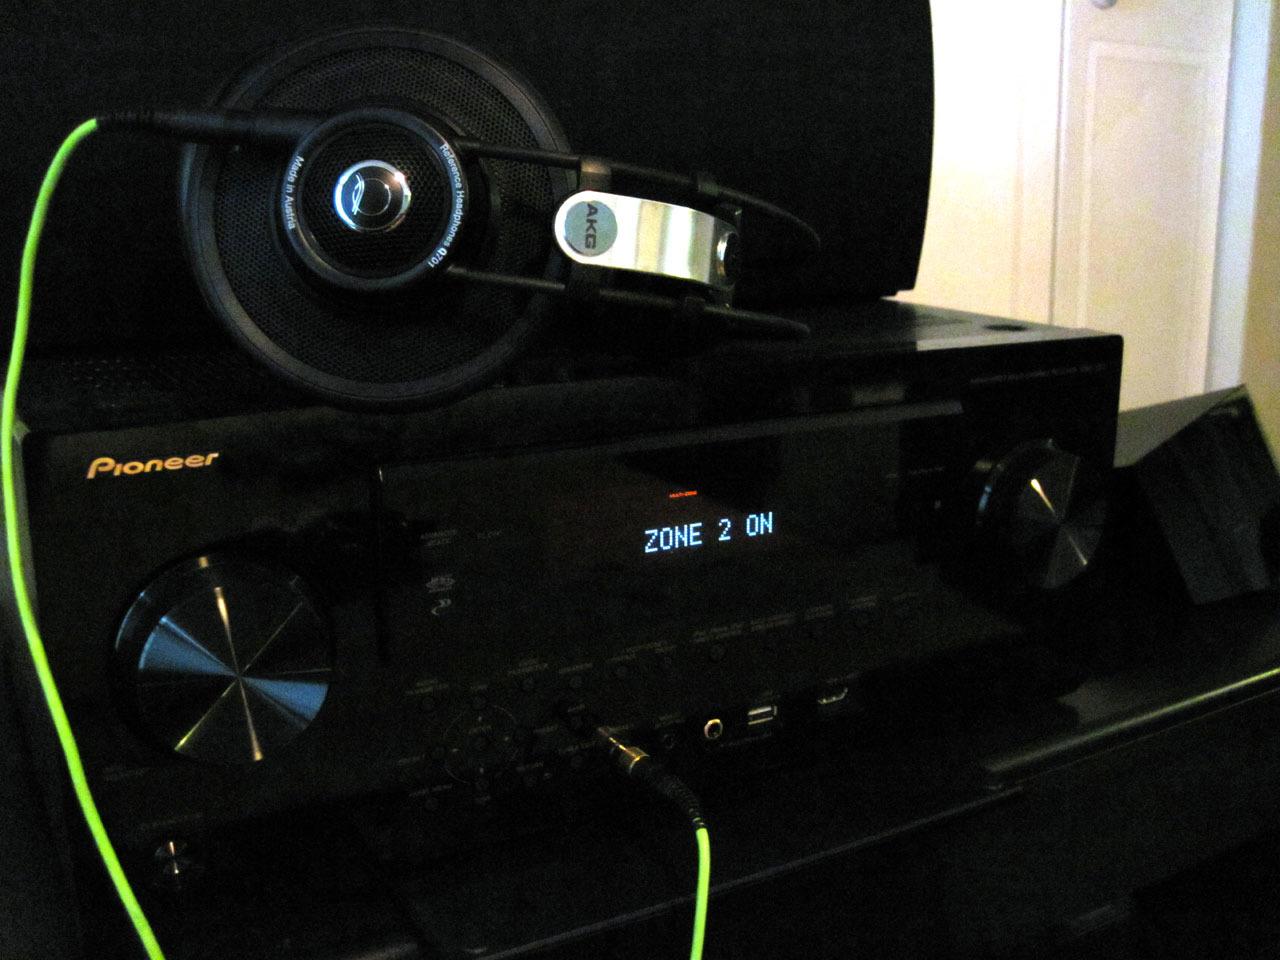 DT880 (600ohm) - Integrated Amp / AV receiver / dac-amp | Headphone